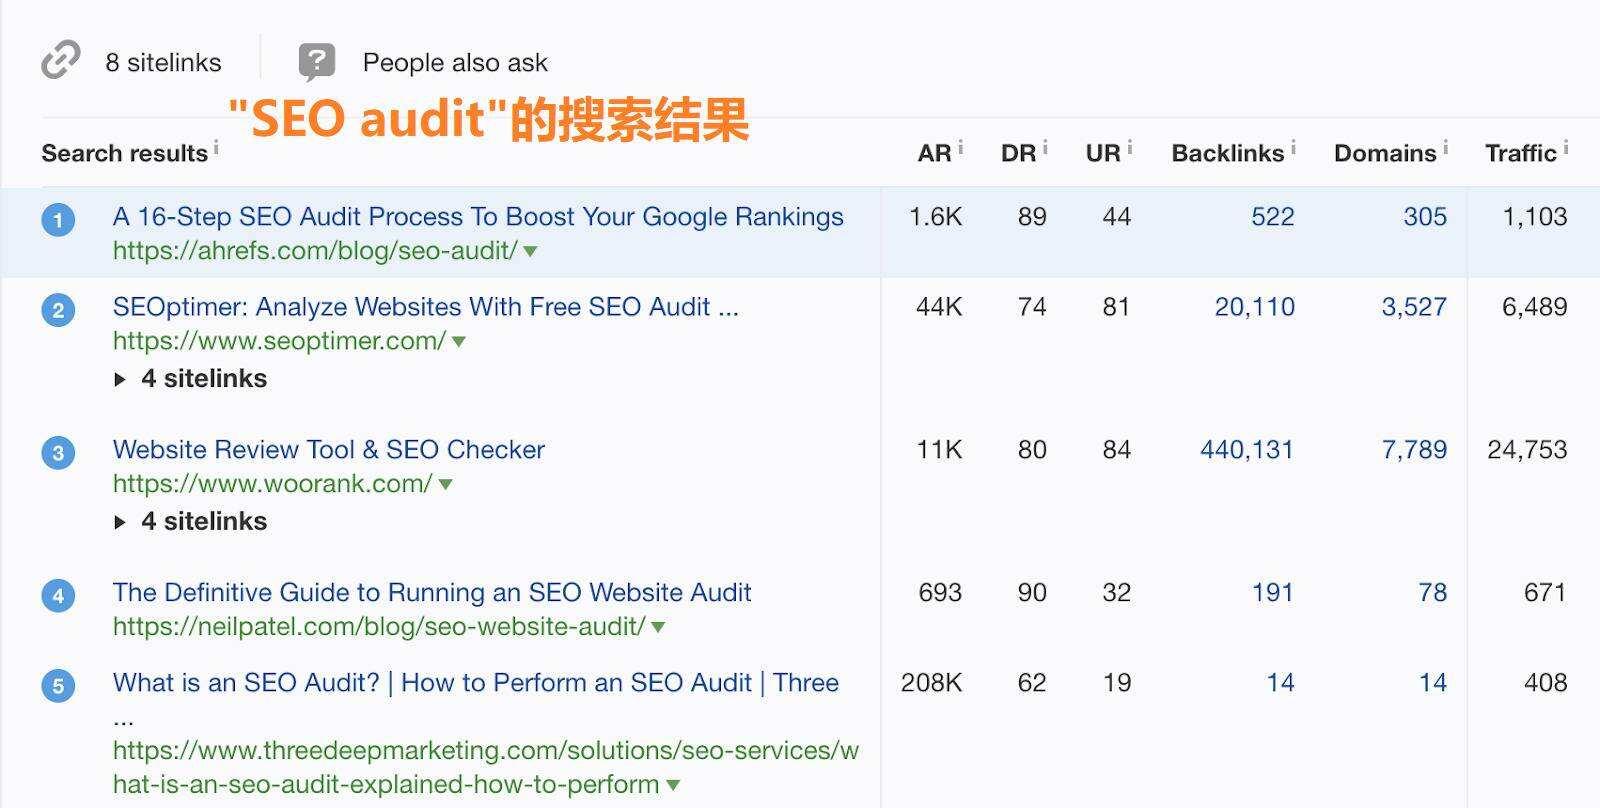 seo audit关键词搜索引擎排名